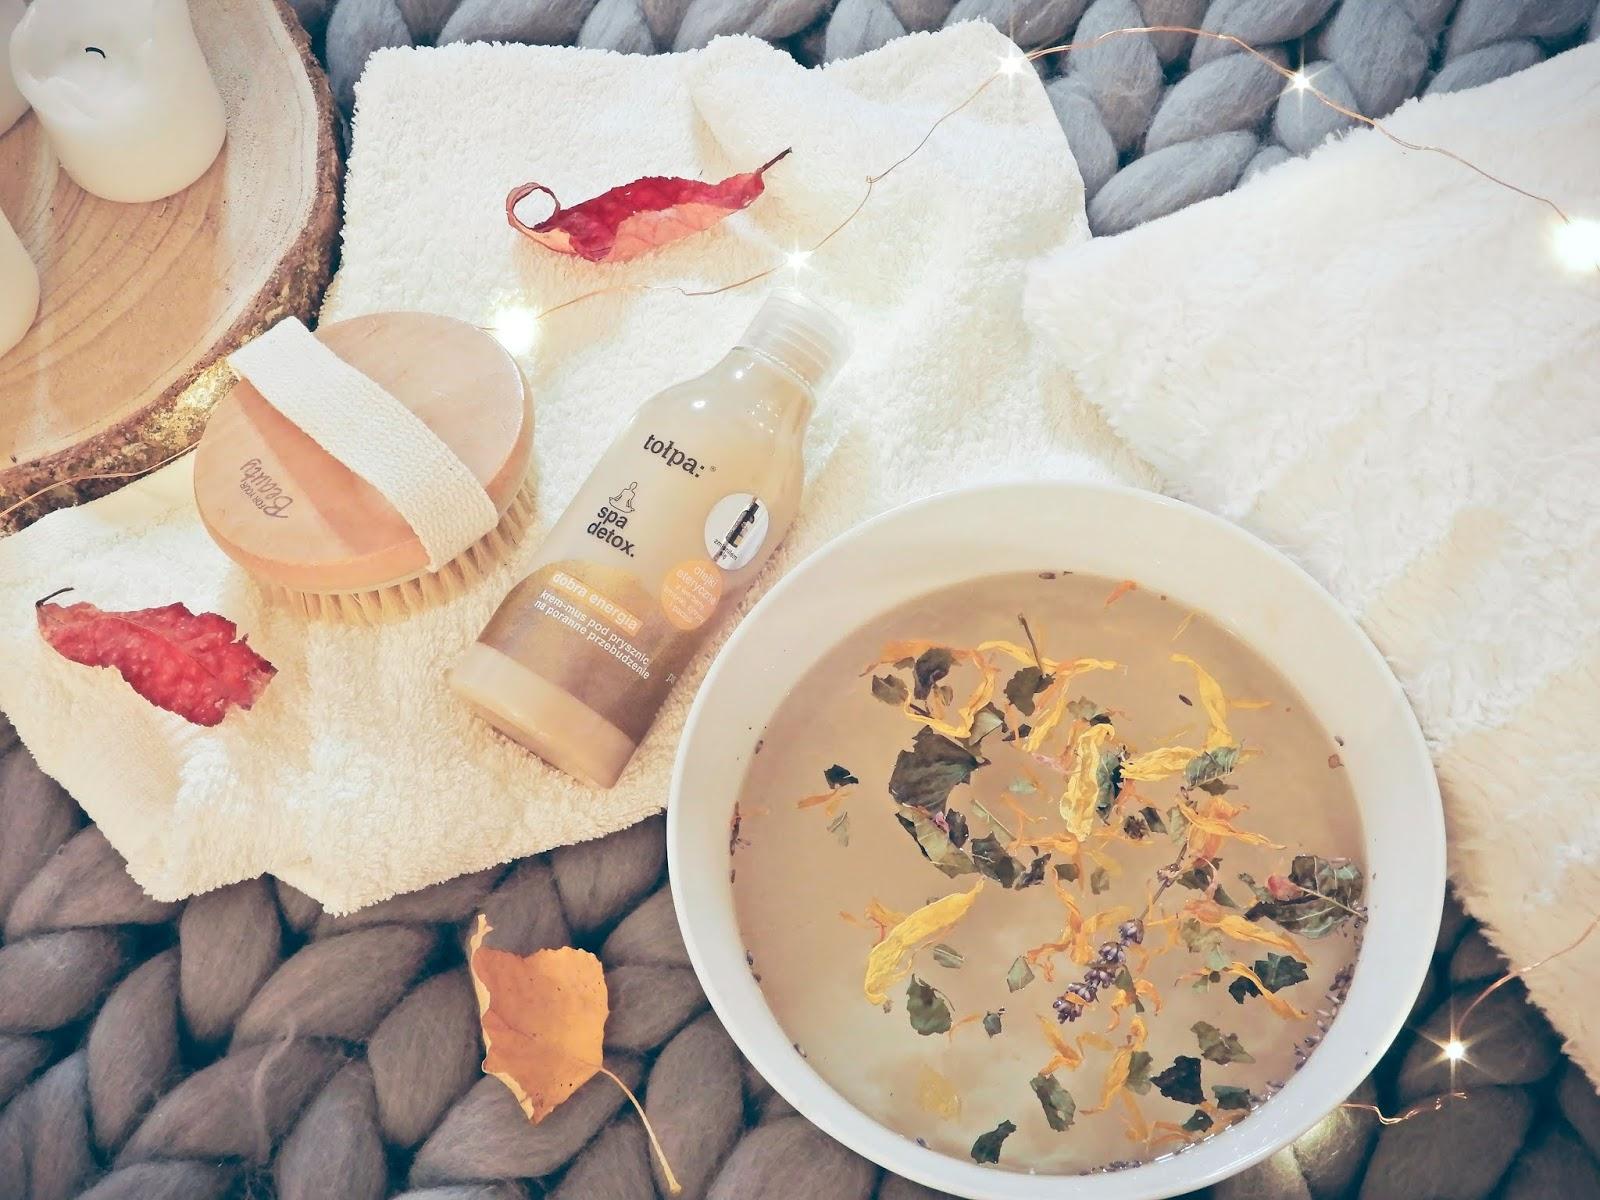 Tołpa Spa detox, Tołpa Spa detox krem-mus pod prysznic, Tołpa Spa detox  kąpiel borowinowa do odnowy biologicznej, tołpa spa detox sól do kąpieli, tołpa spa detox peeling do odnowy biologicznej przed snem,